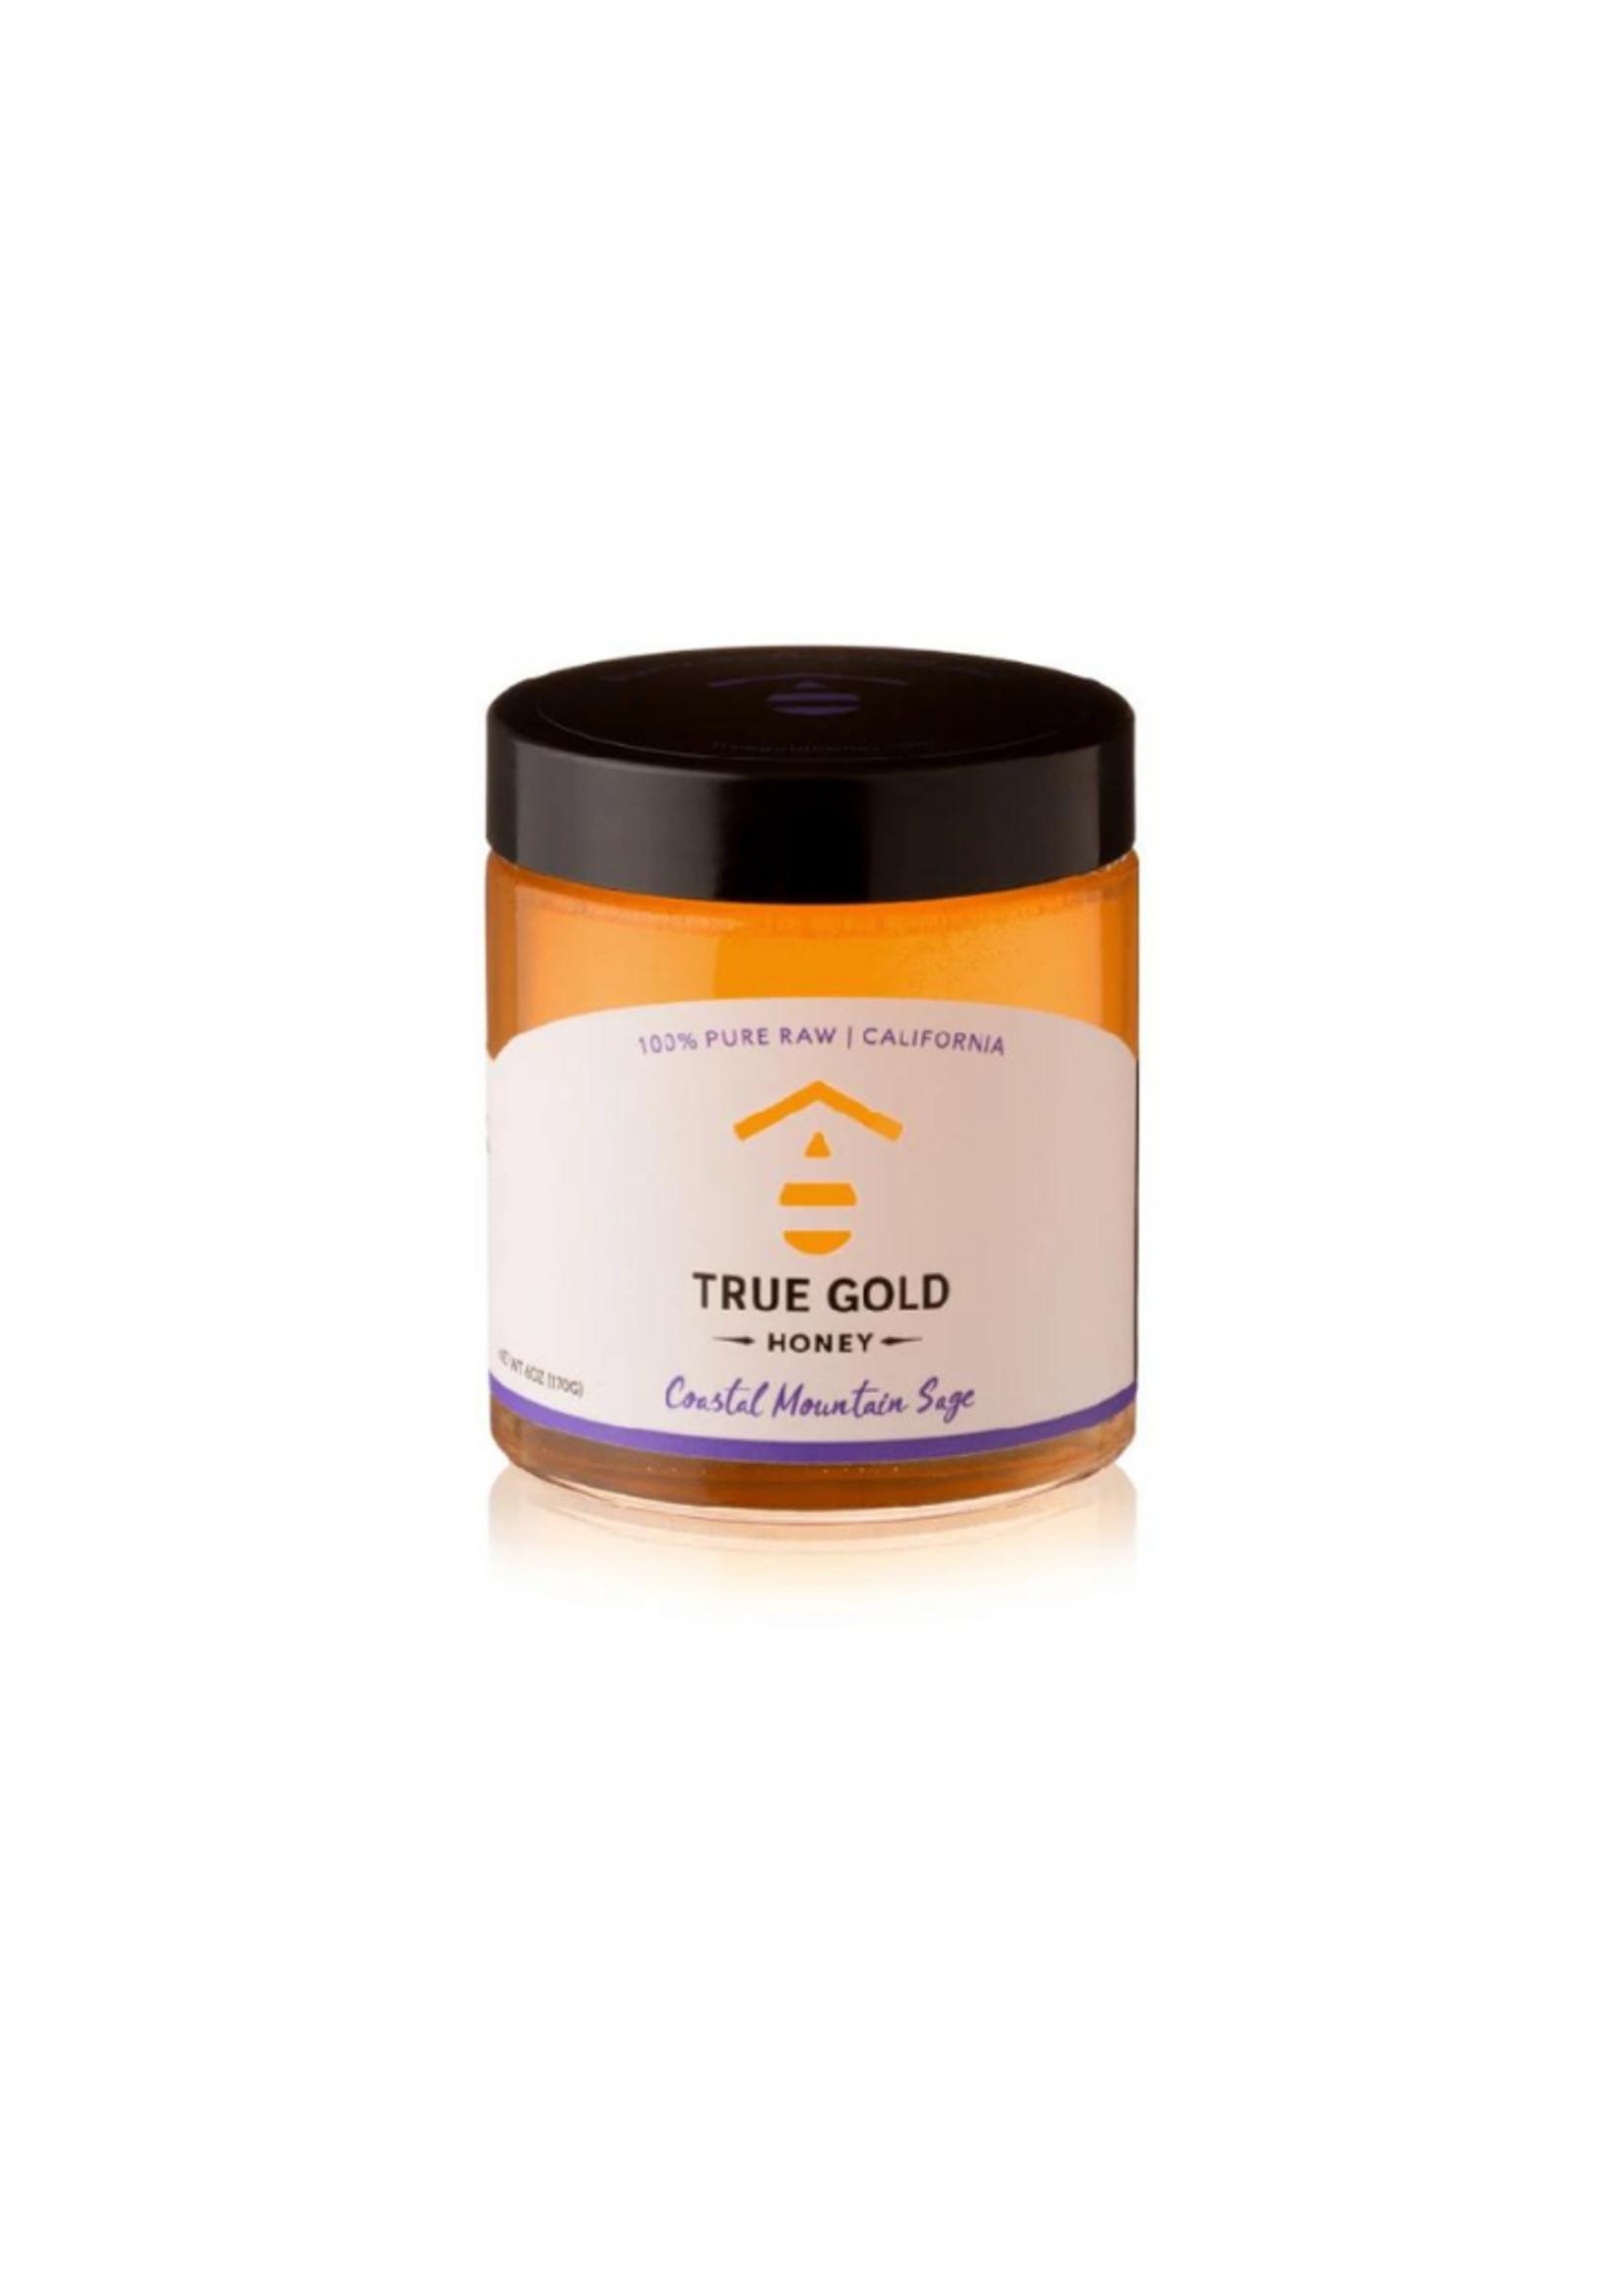 True Gold Honey 6 oz Costal Mountain Sage Honey